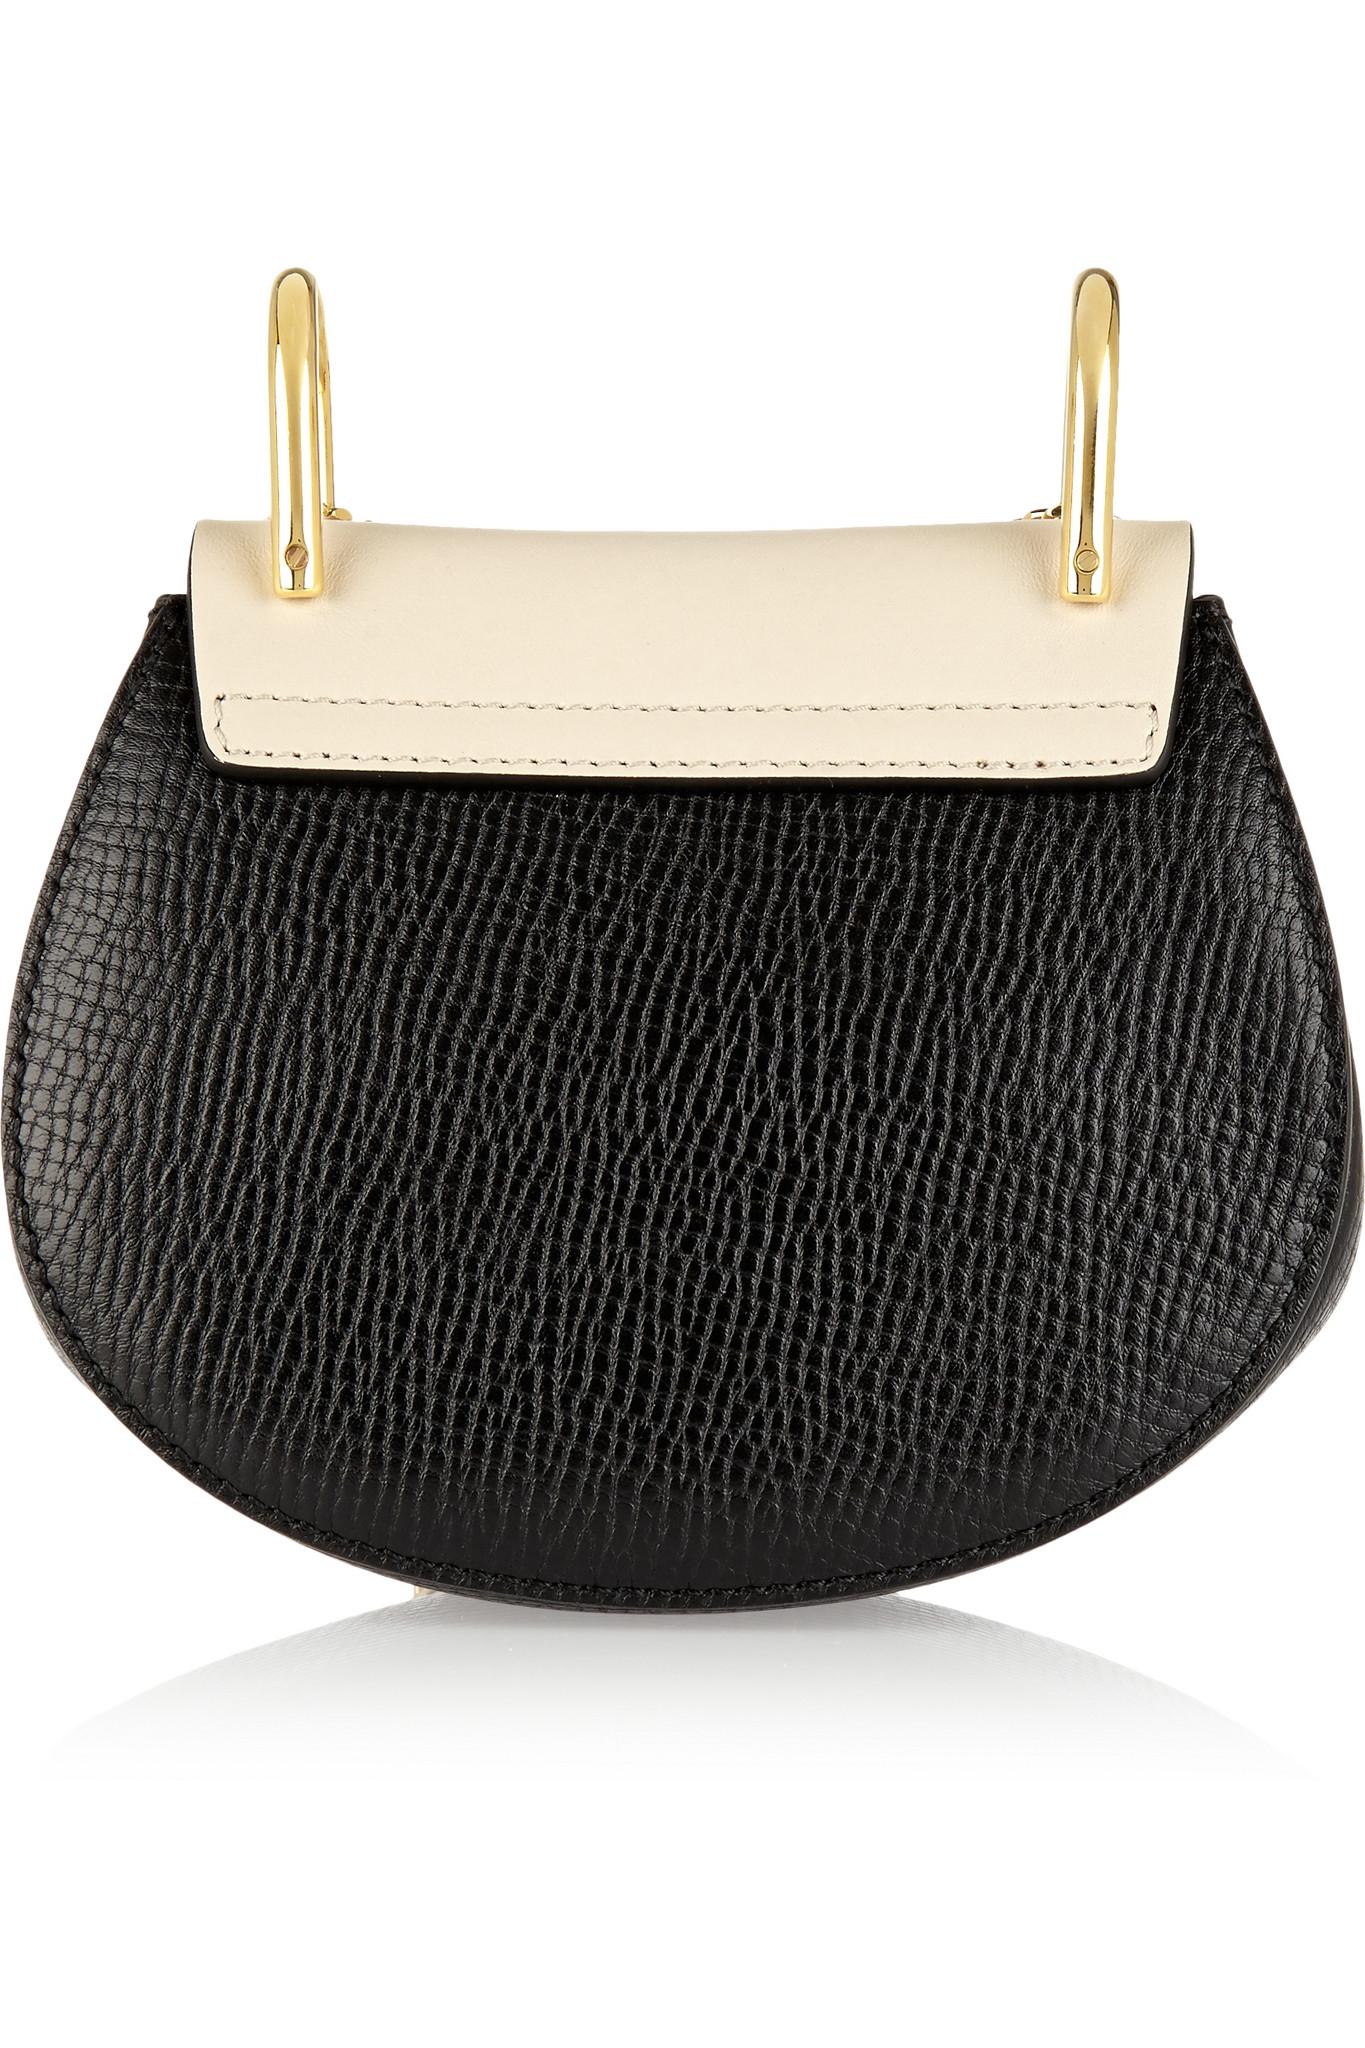 chloe drew nano black textured leather bag